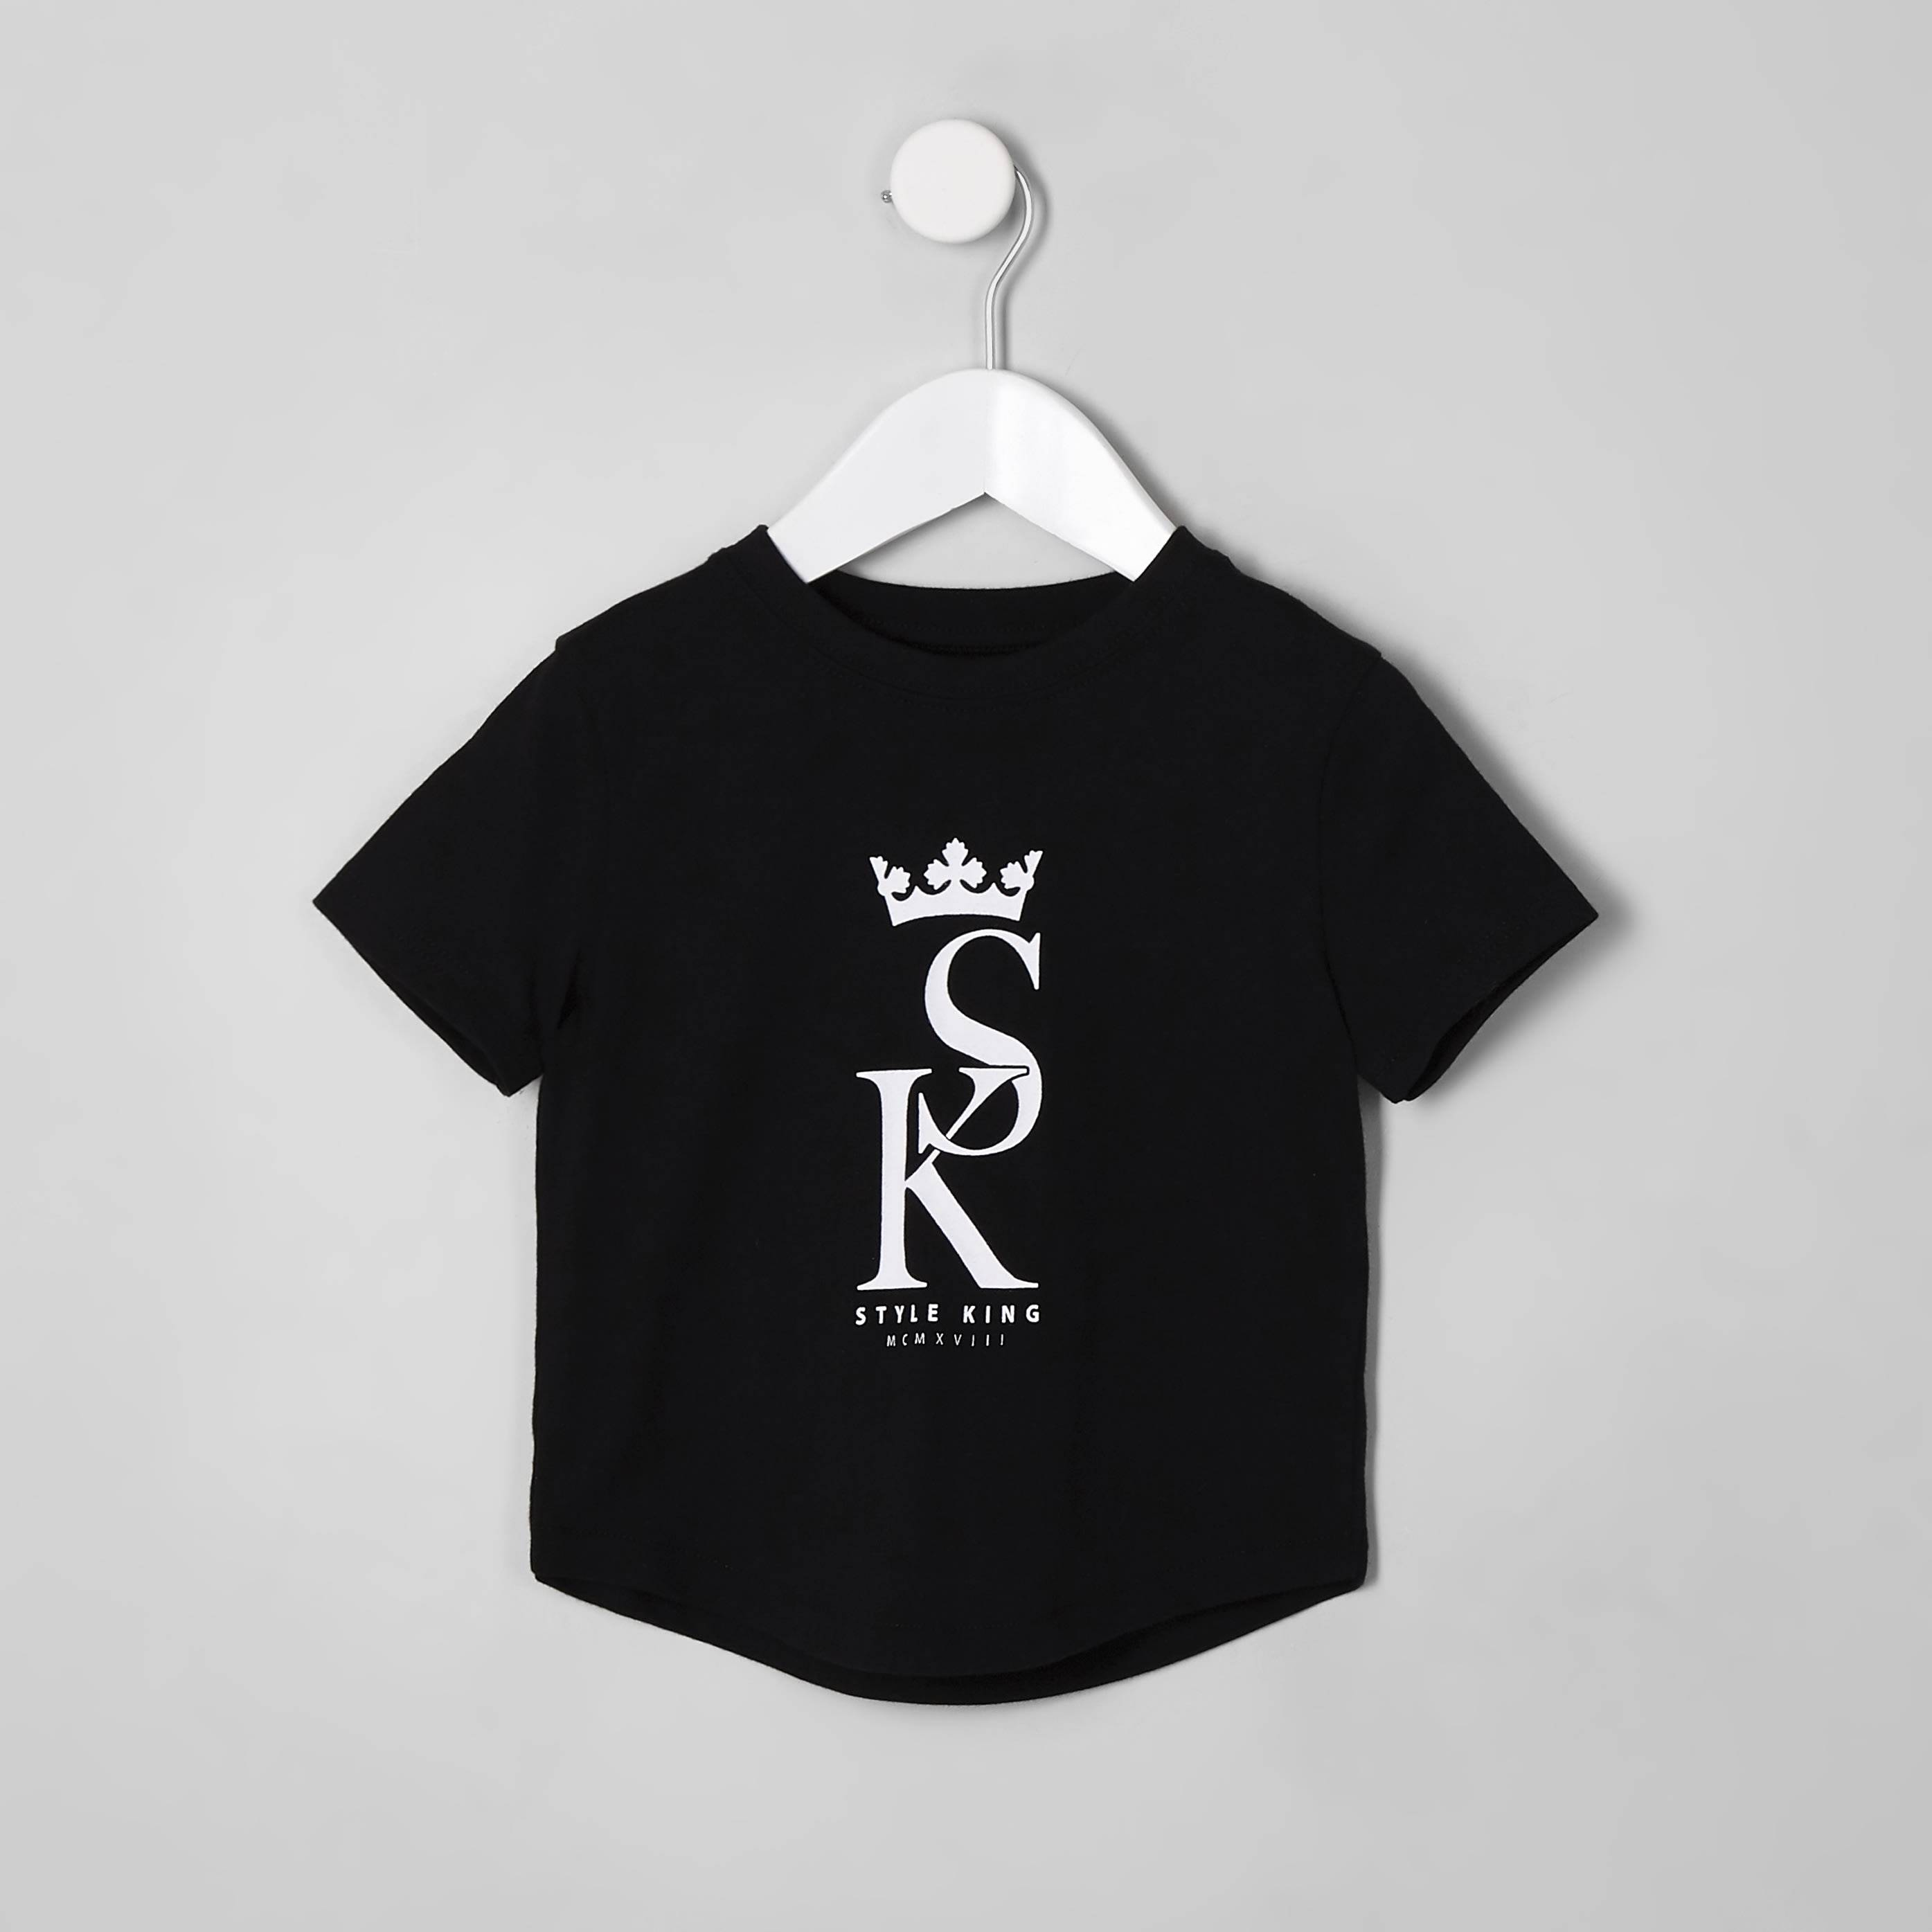 River Island Mens Baby Boys Black 'style king' T-shirt (3-6 Mths)